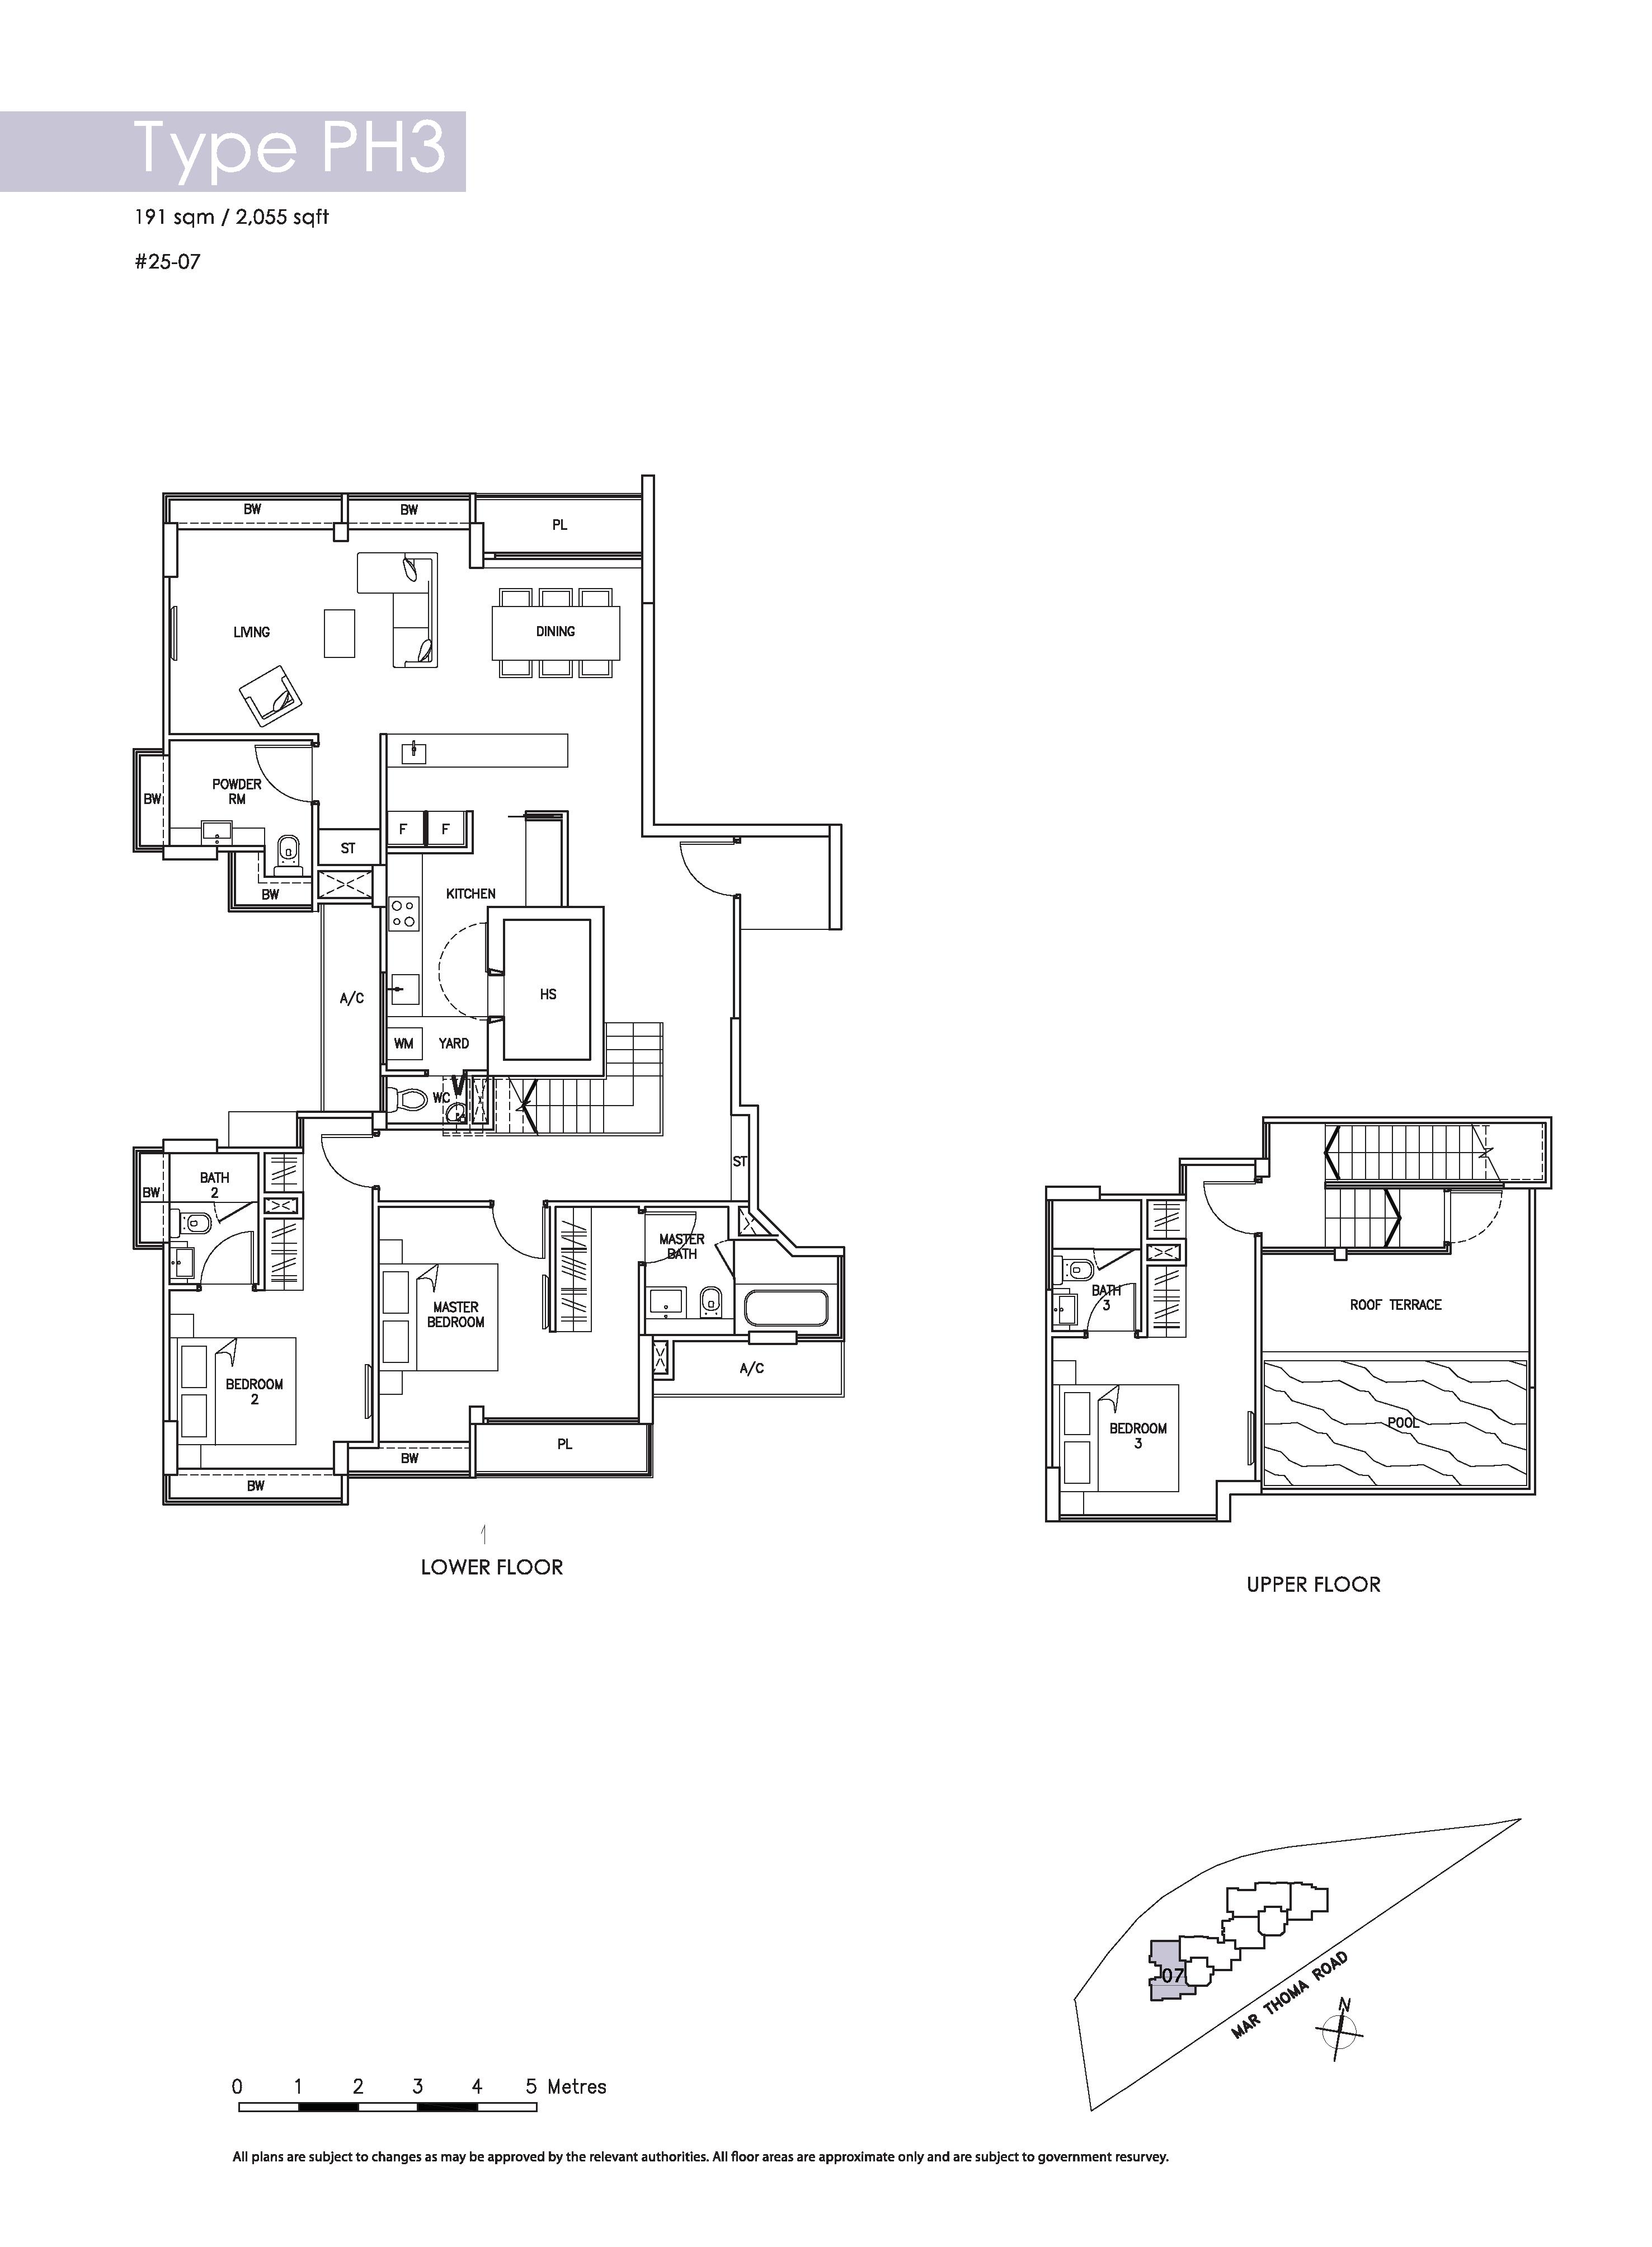 penthouse 3 bed riverbay. Black Bedroom Furniture Sets. Home Design Ideas